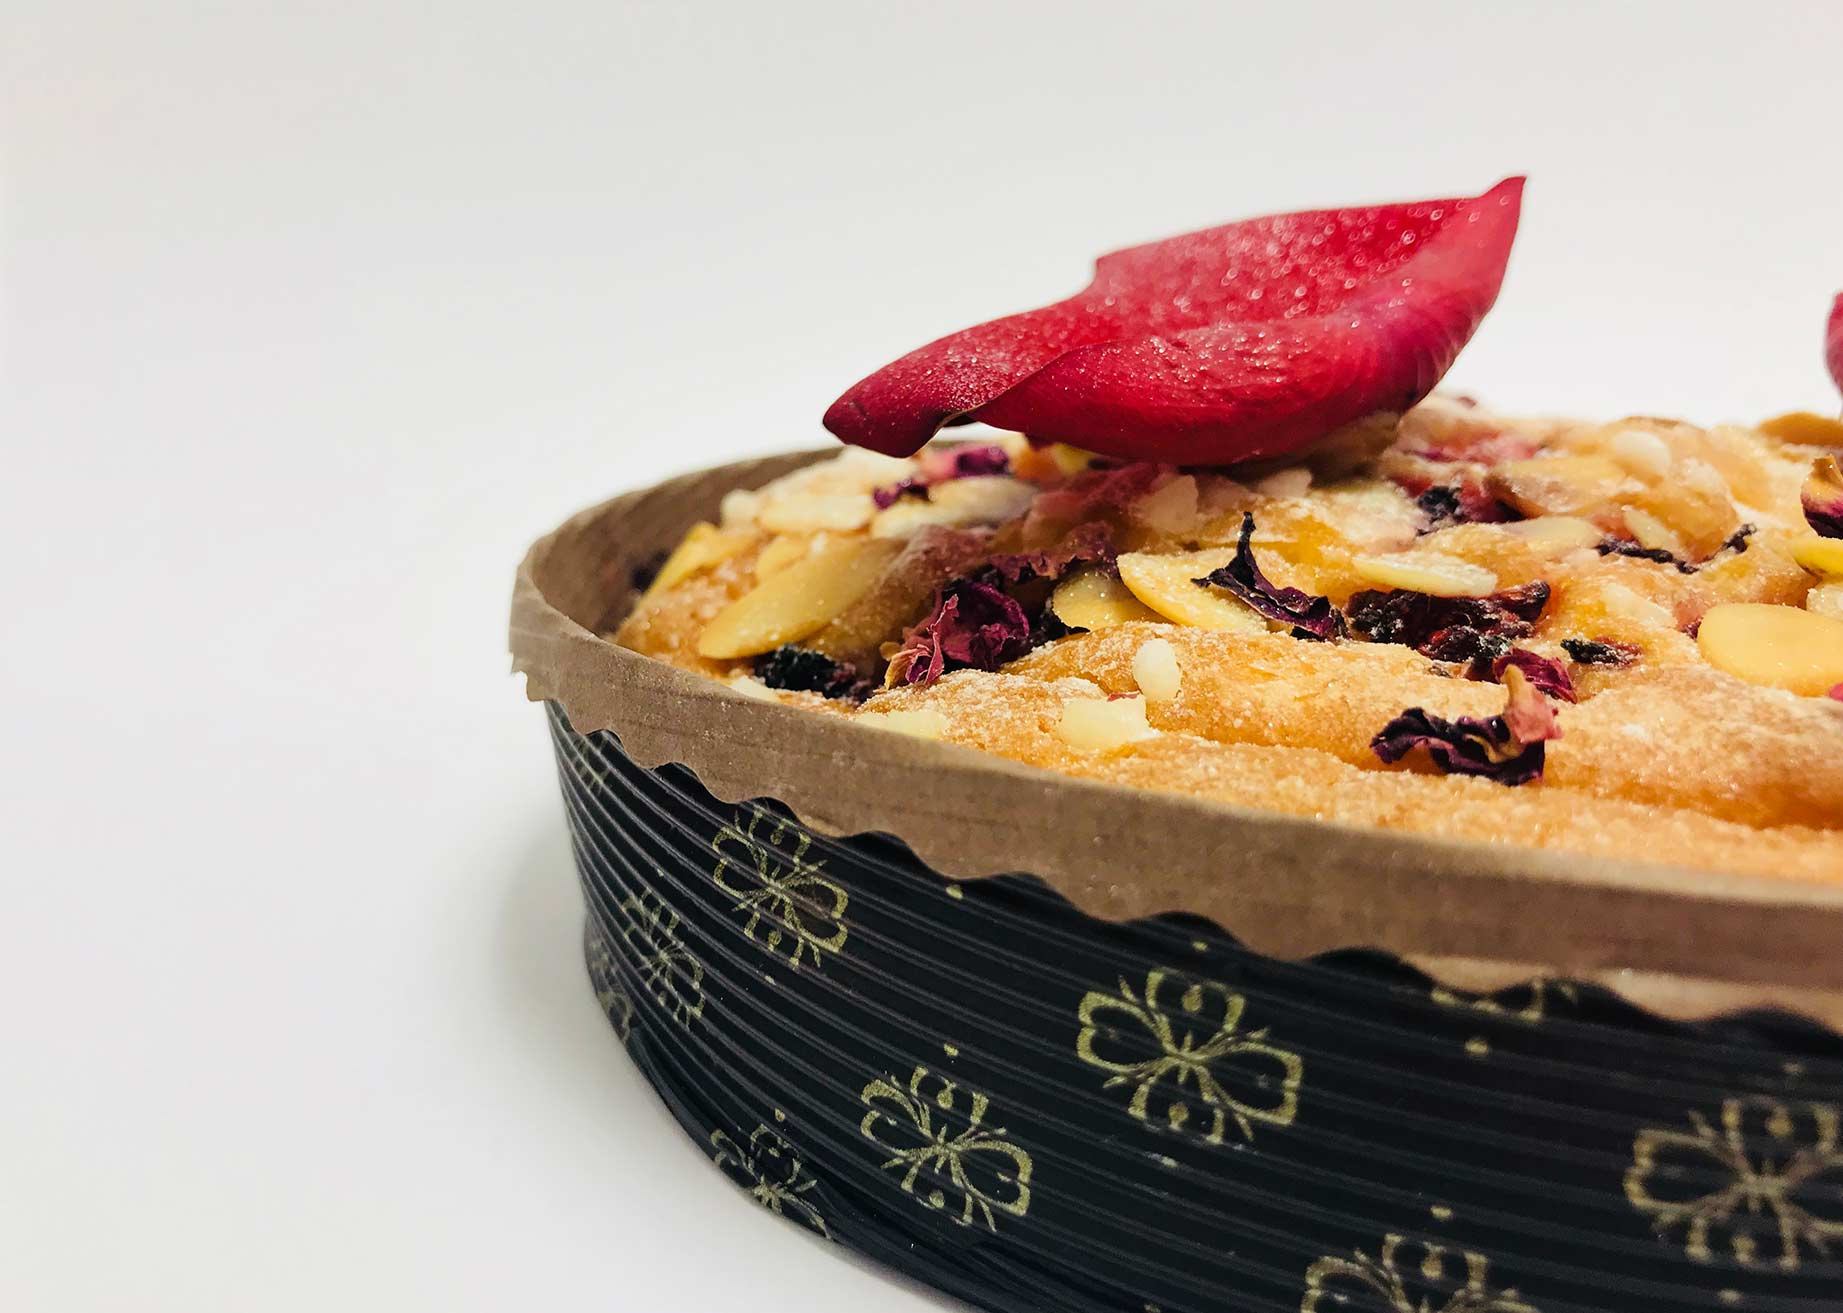 MBB Novacart paper baking mold and women's day almond tart